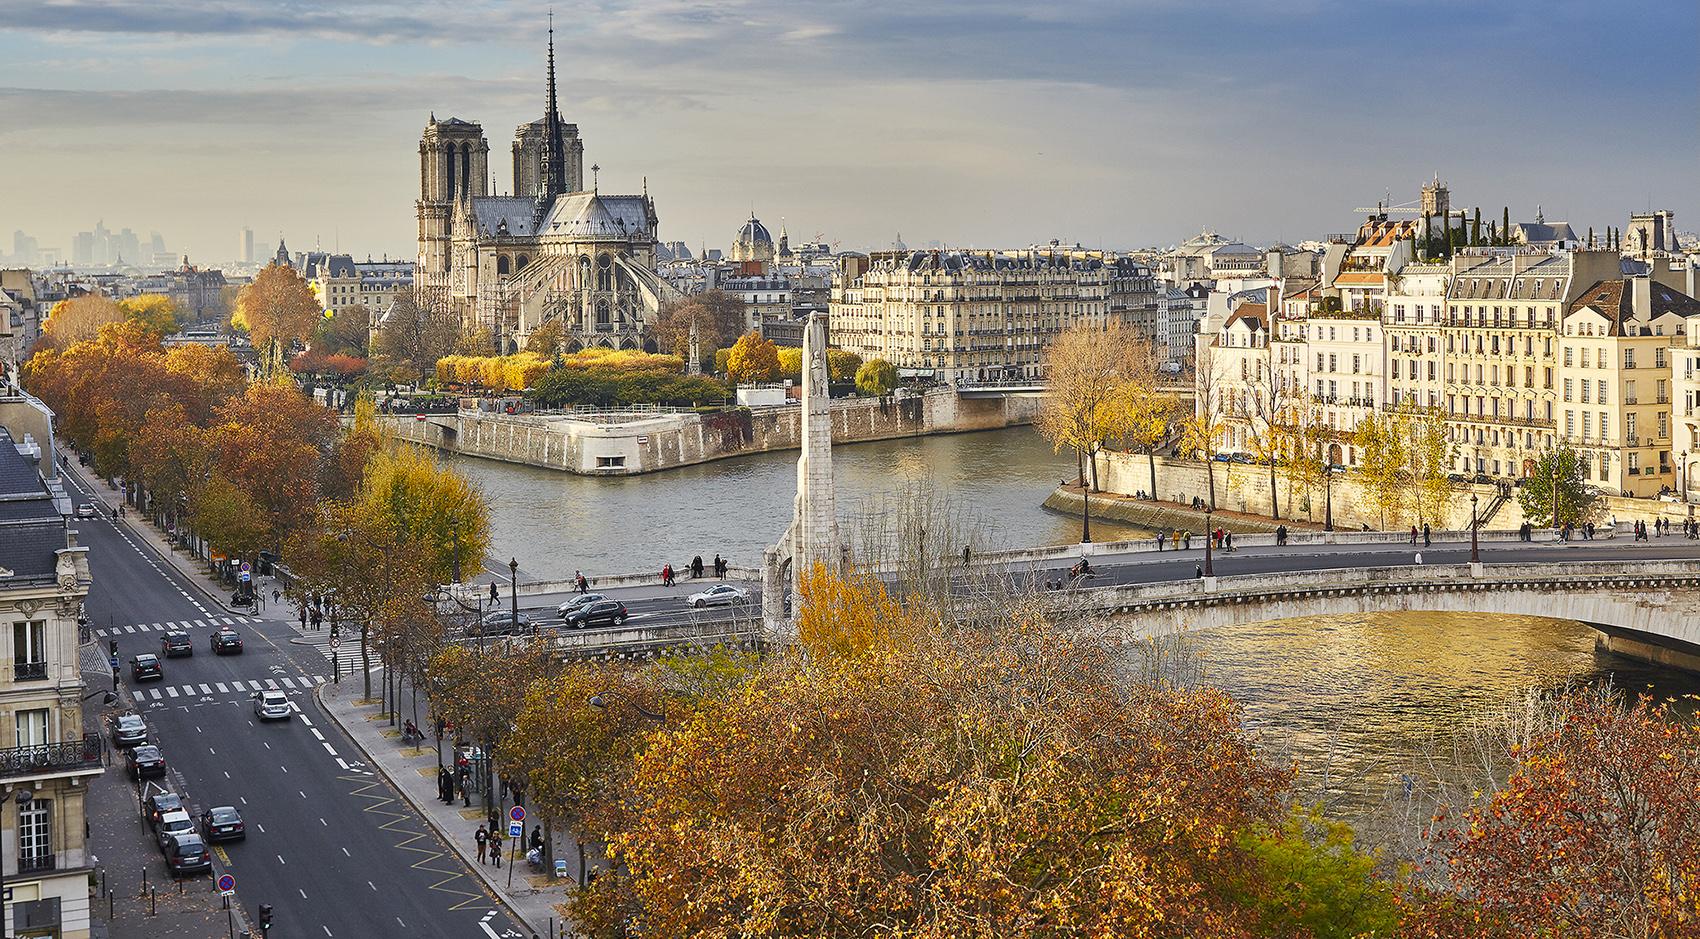 Notre-Dame de Paris on a bright fall day